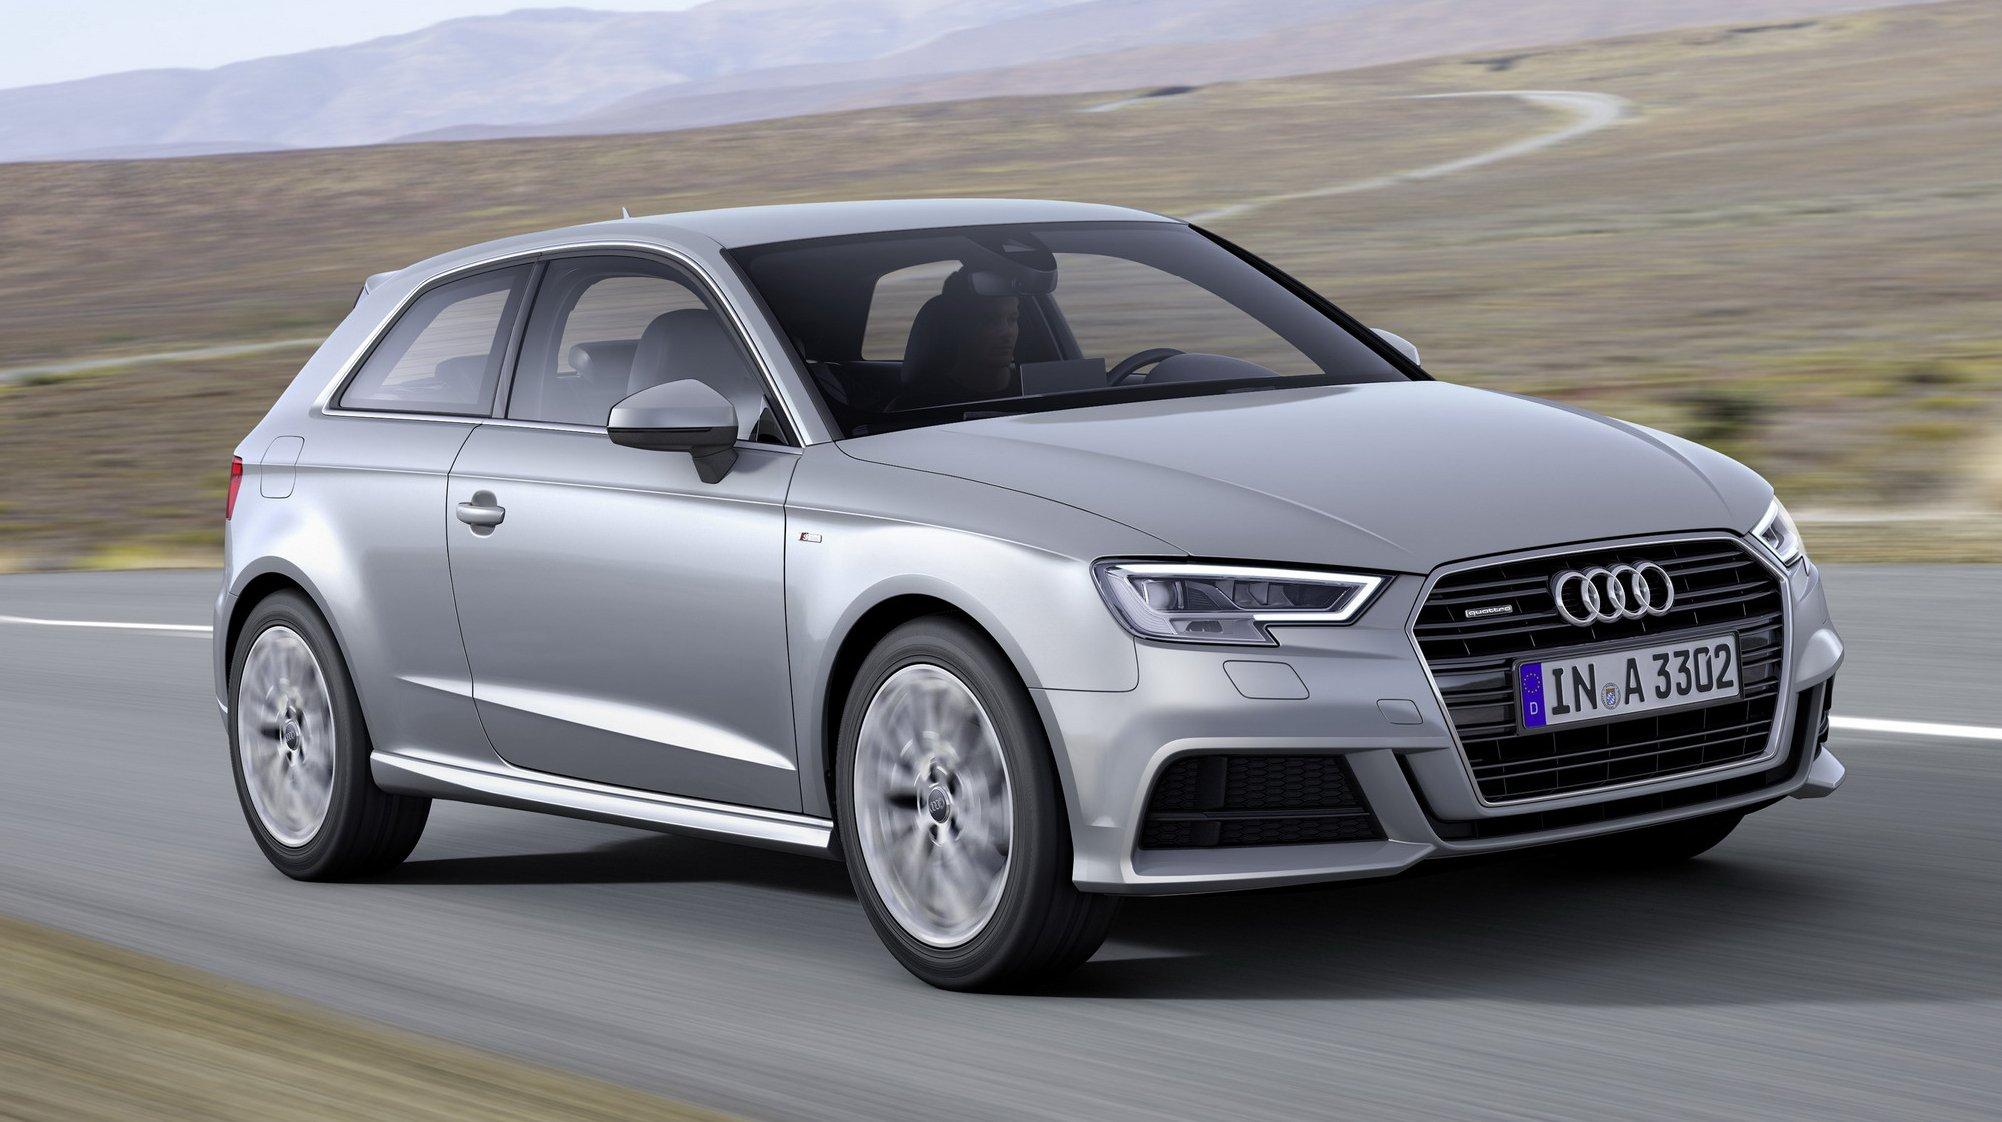 Audi A 3 05